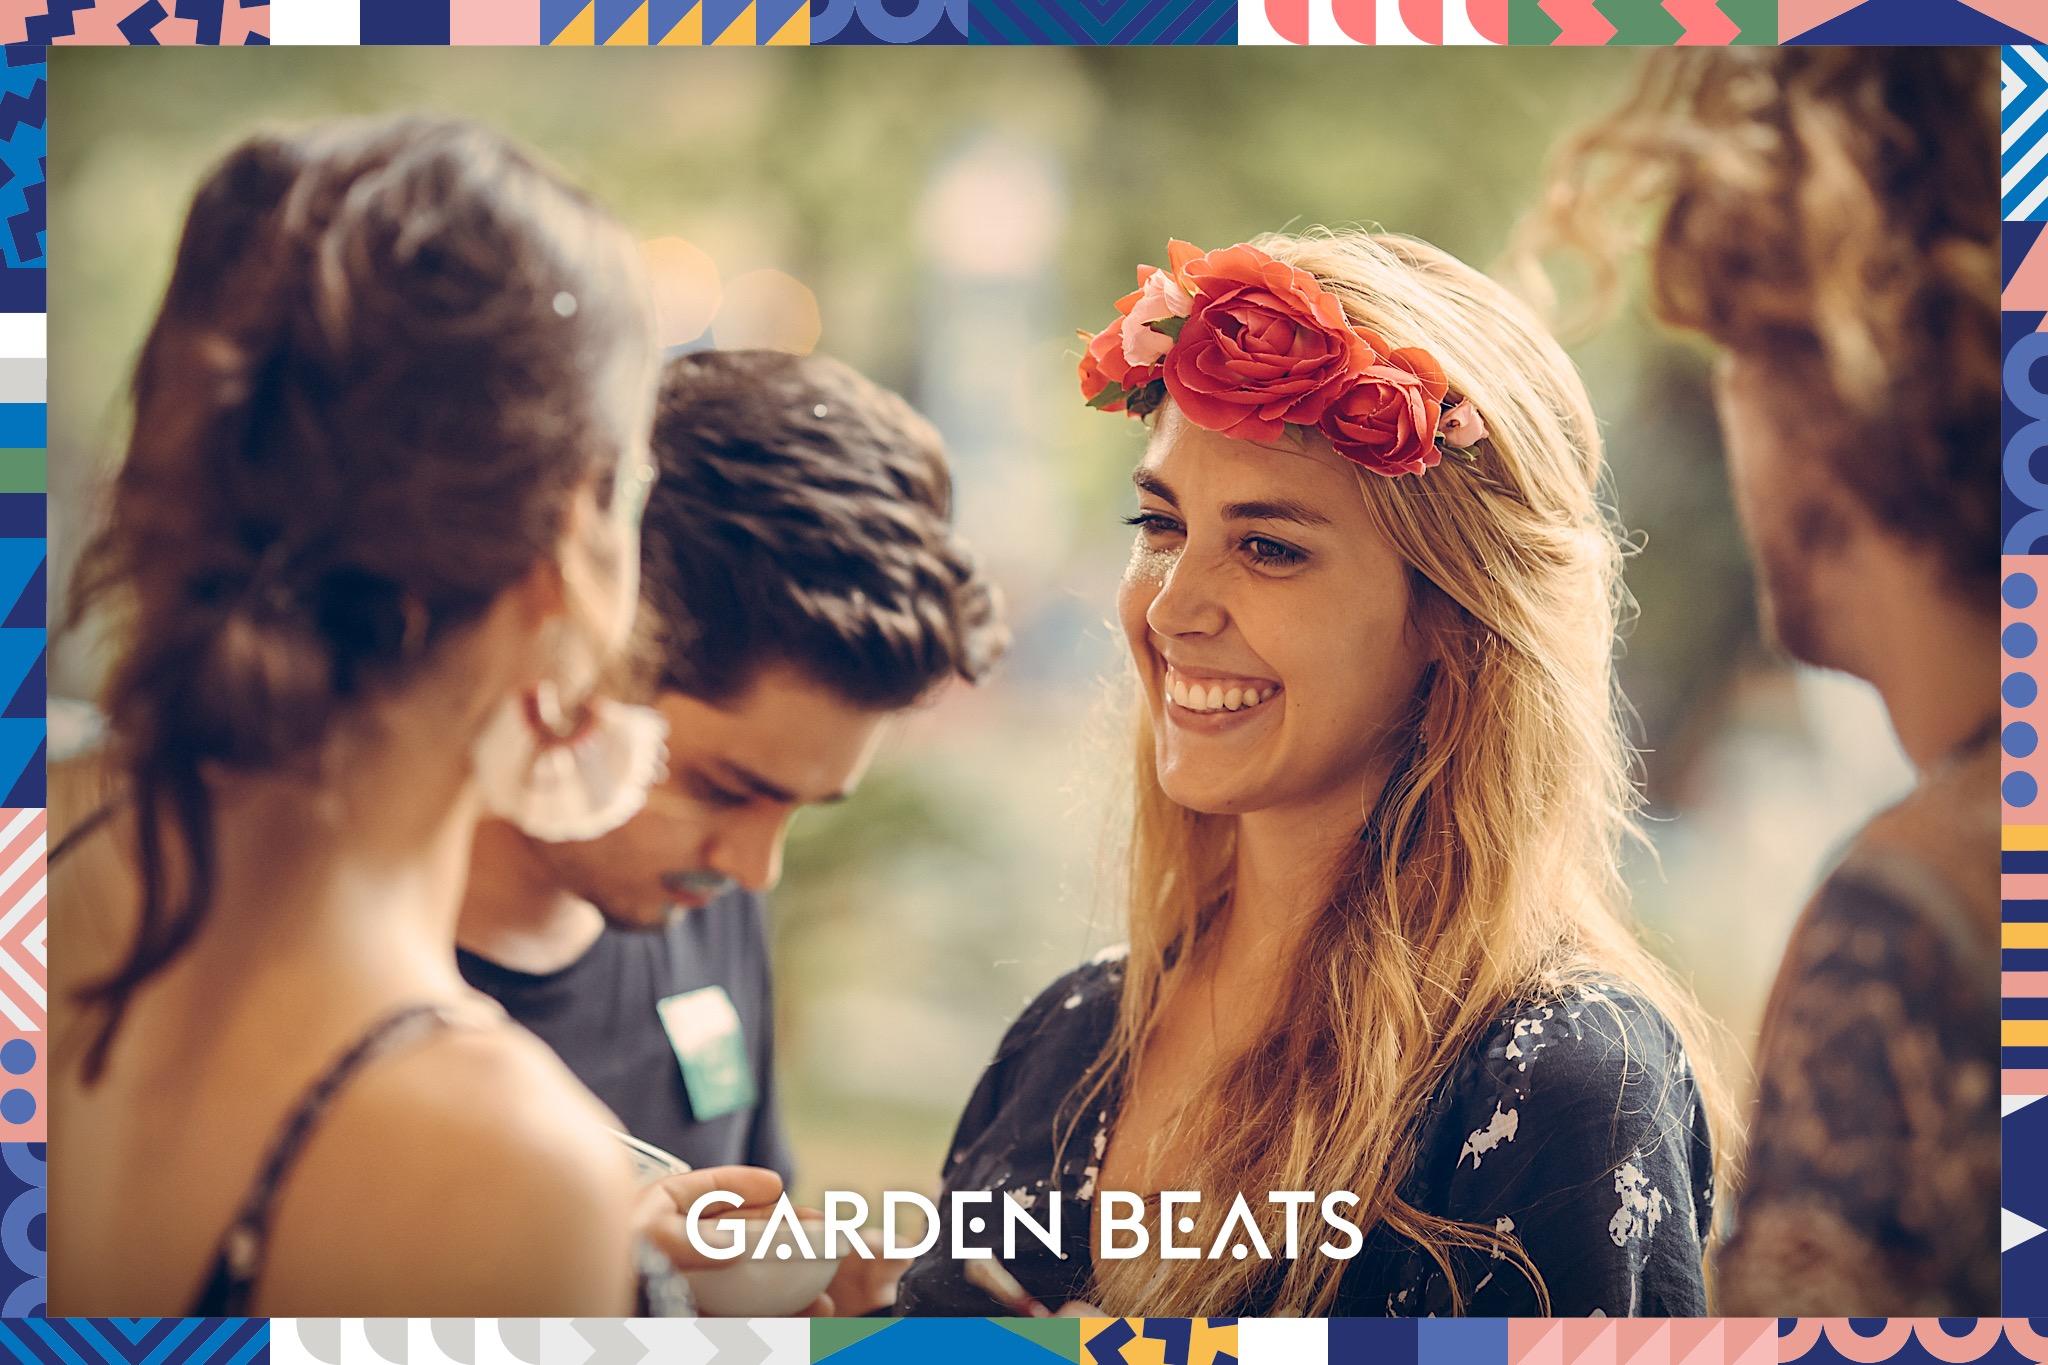 03032018_GardenBeats_Colossal355_Watermarked.jpg